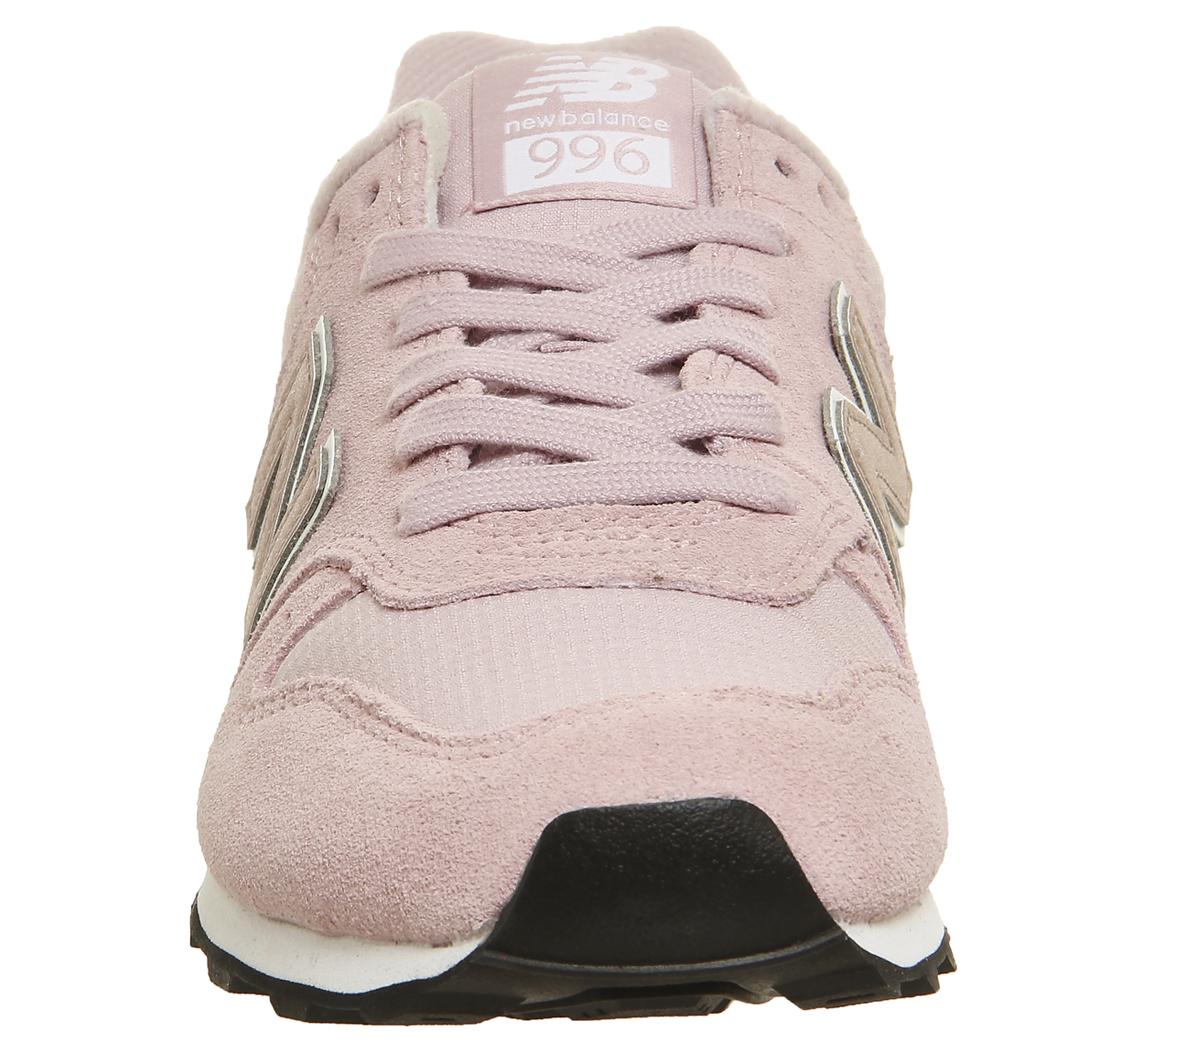 Damenschuhe PINK New Balance Wr996 Trainers PINK Damenschuhe NEW Trainers Schuhes 219c59